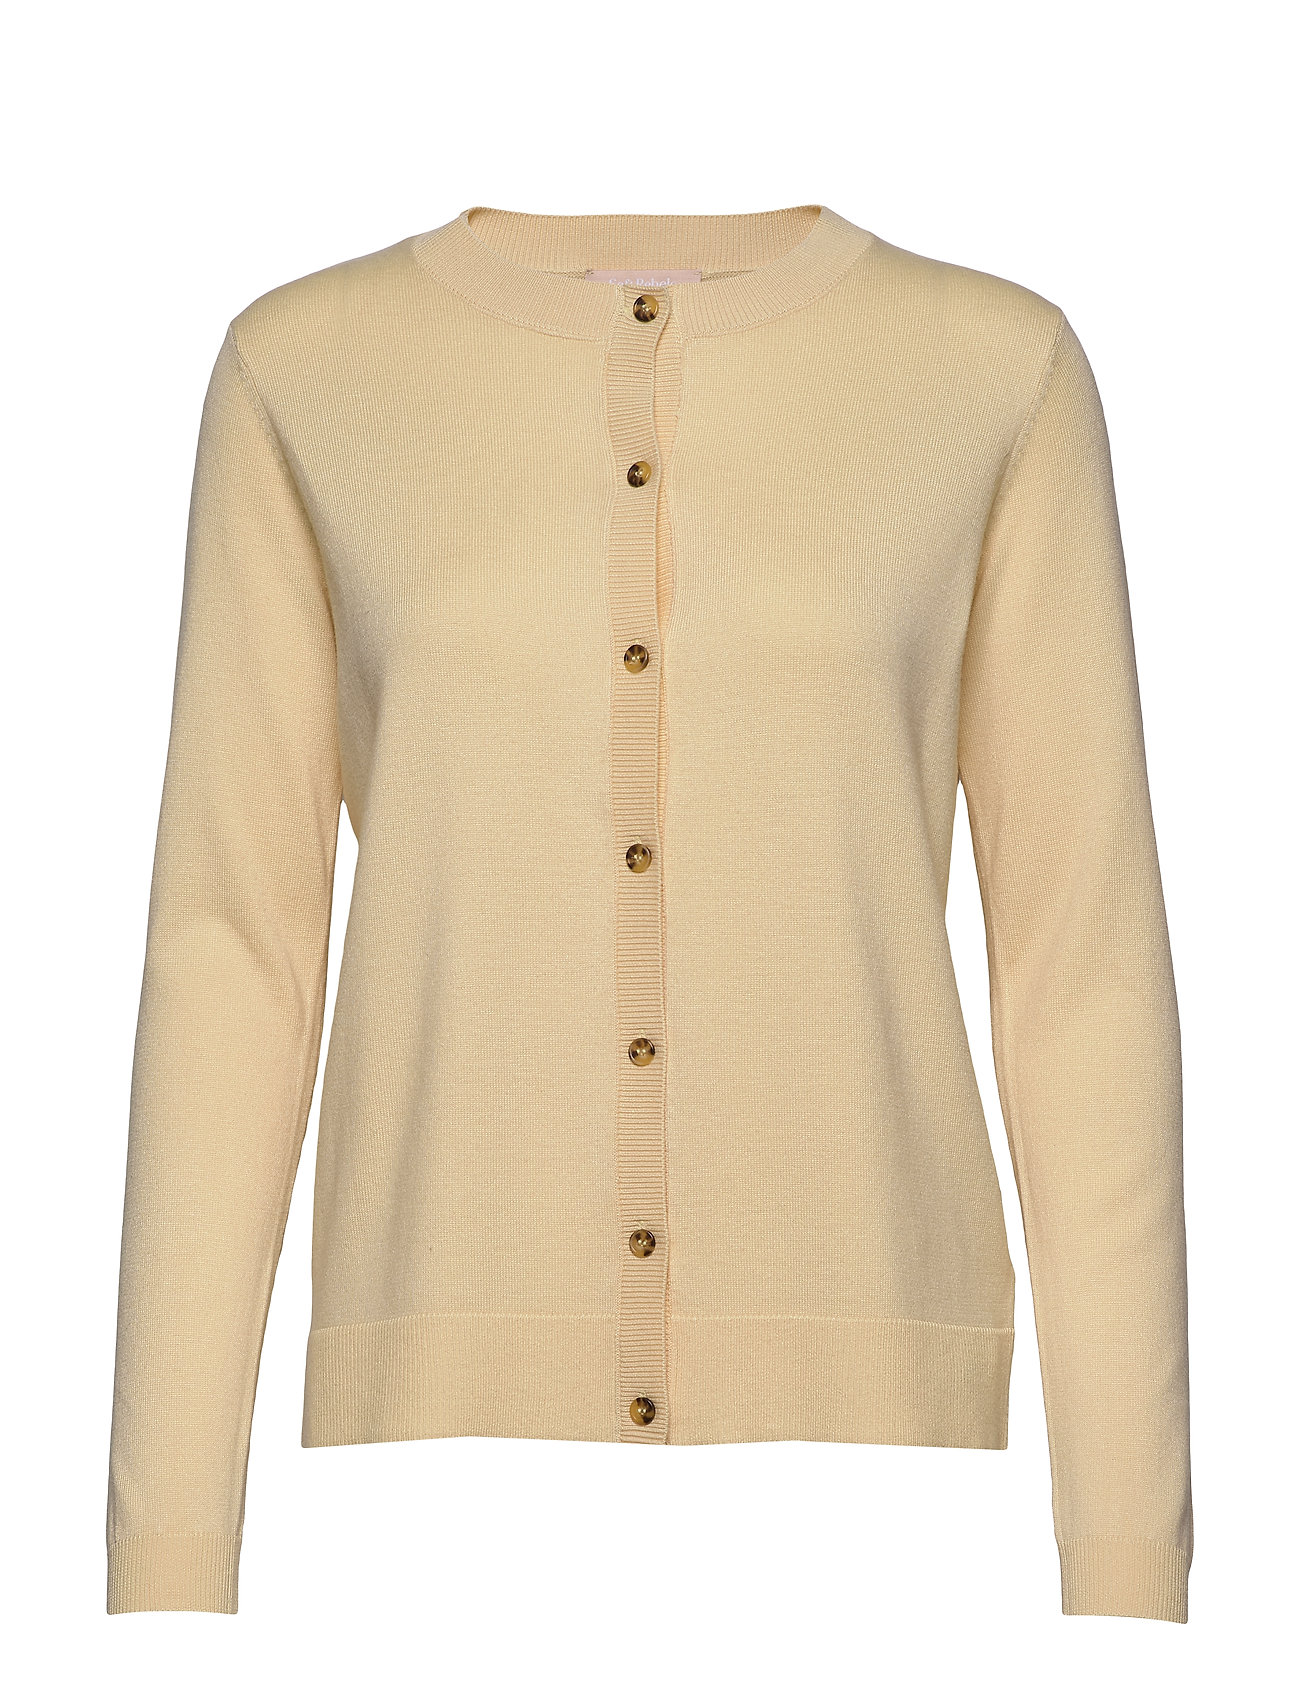 Soft Rebels Zara New O-neck Cardigan - PINEAPPLE SLICE